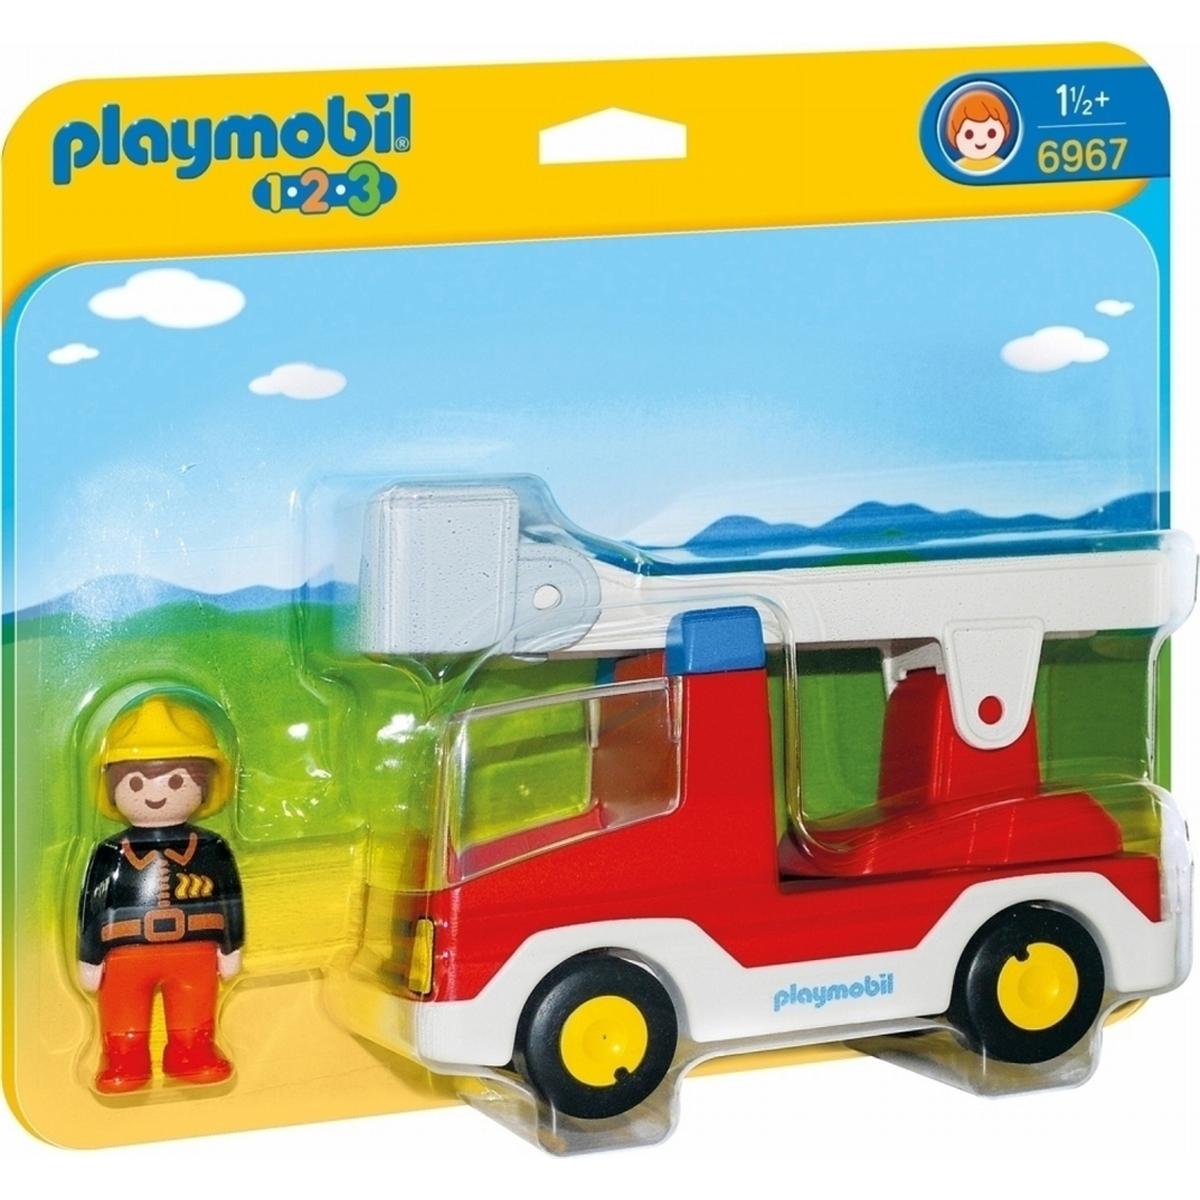 Playmobil 6967 1.2.3 Ladder Unit Fire Truck